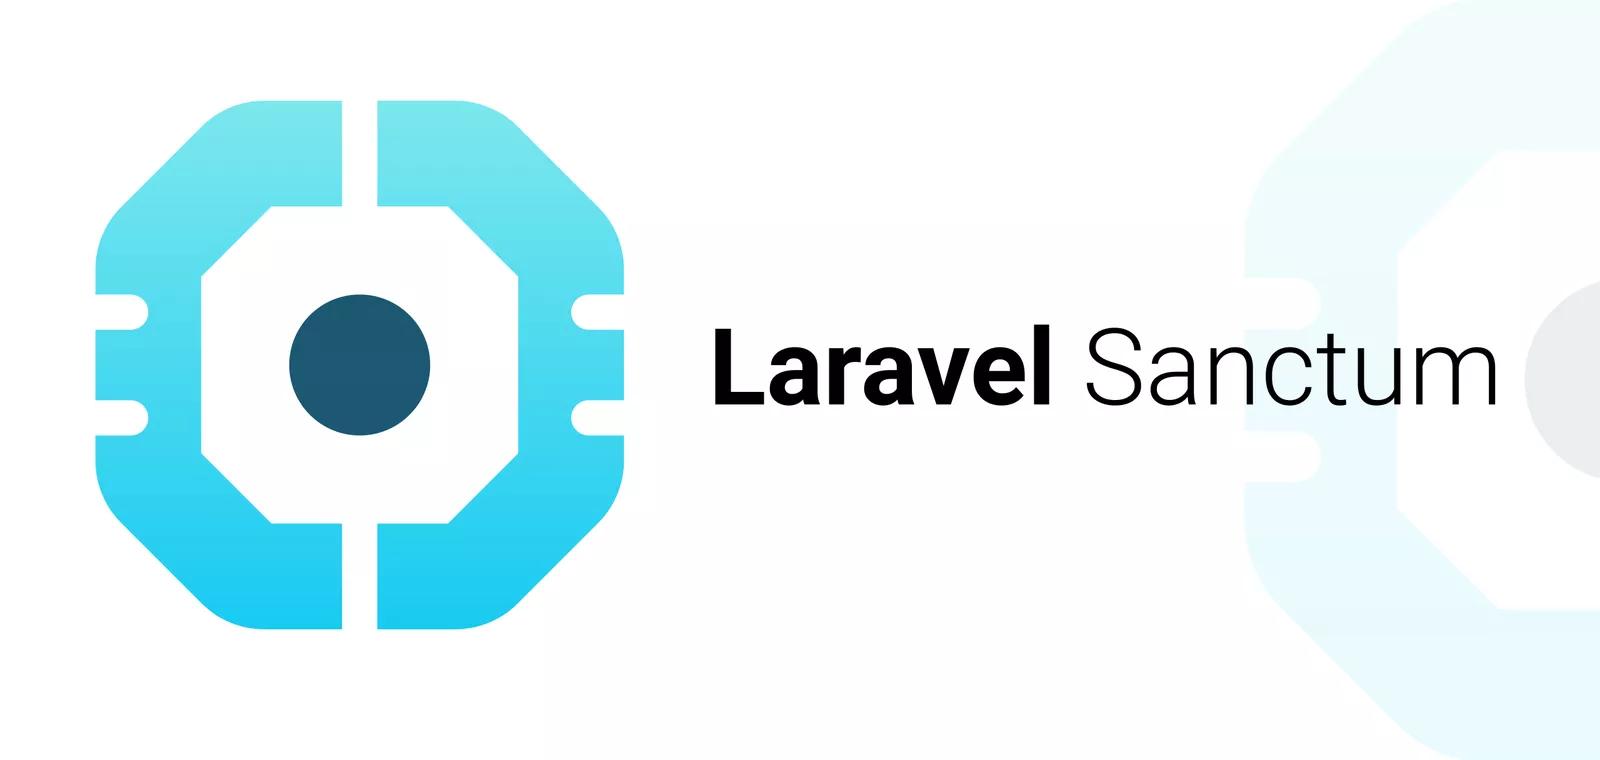 Getting Started With Laravel Sanctum | Raidan.com.au